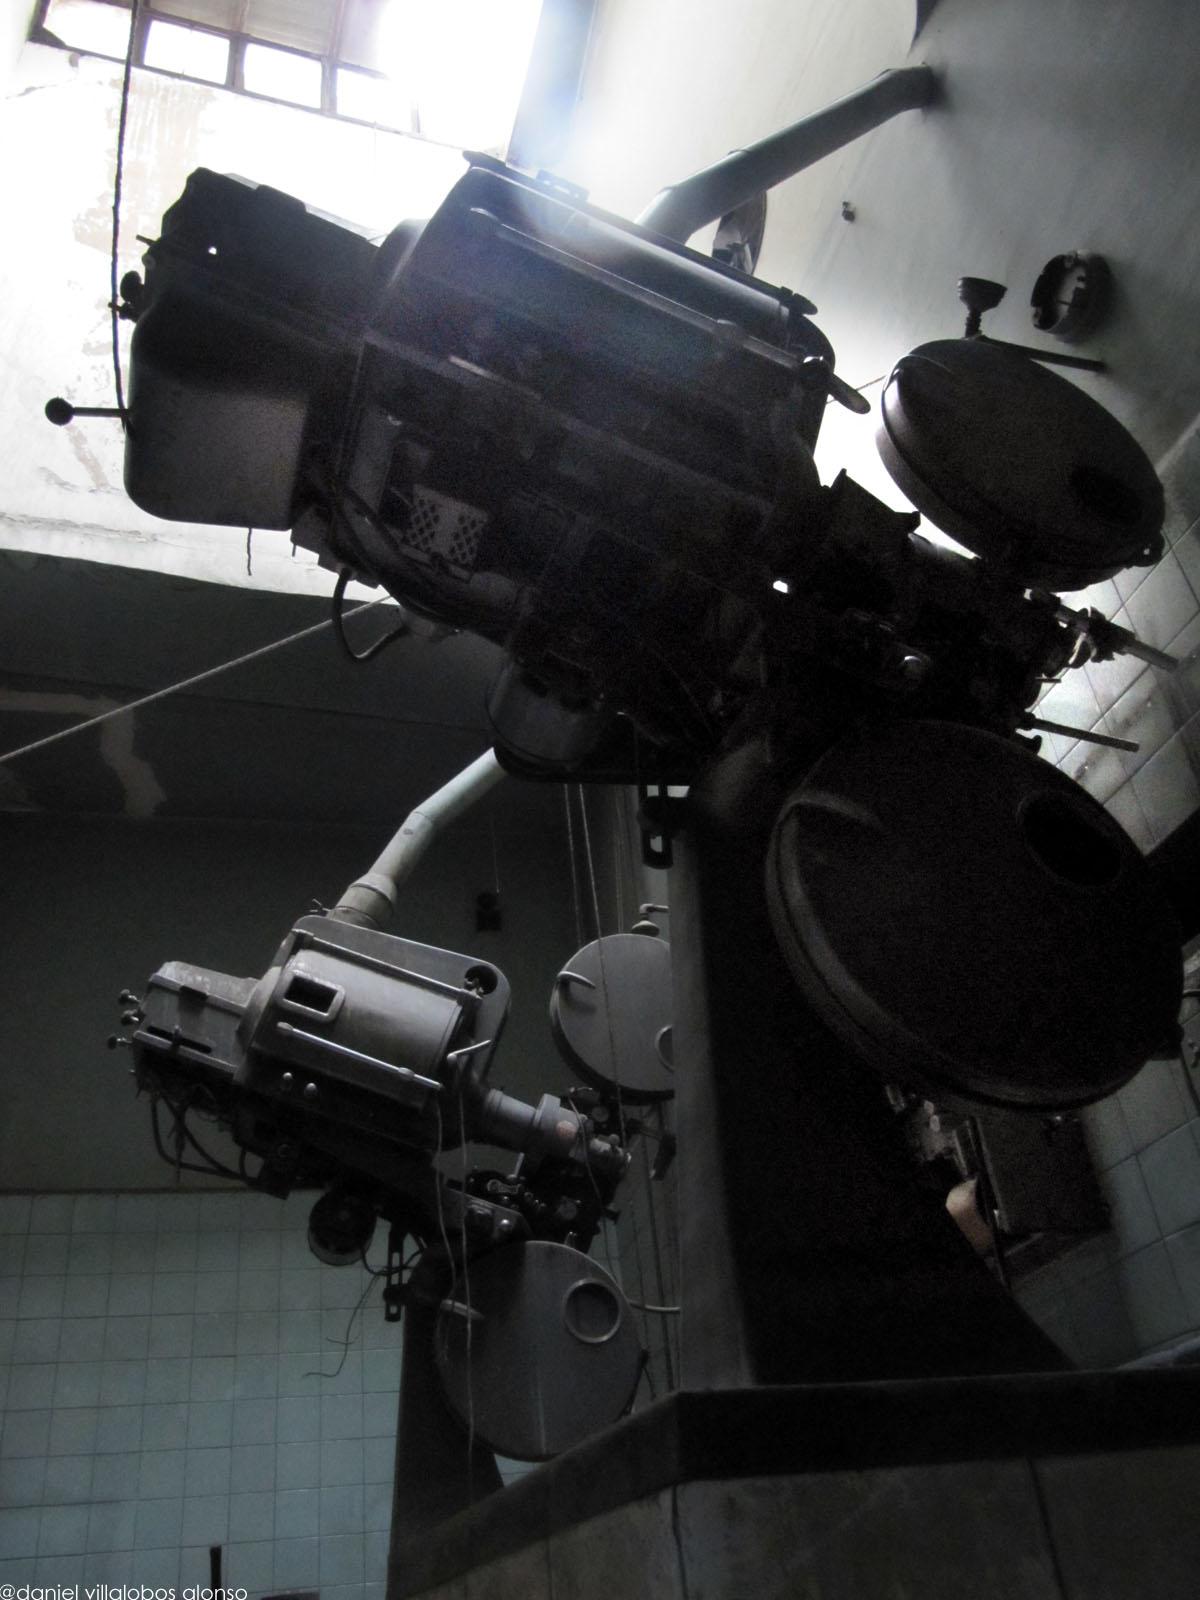 danielvillalobos-cines-digitalphotographies-modernarchitecture-30